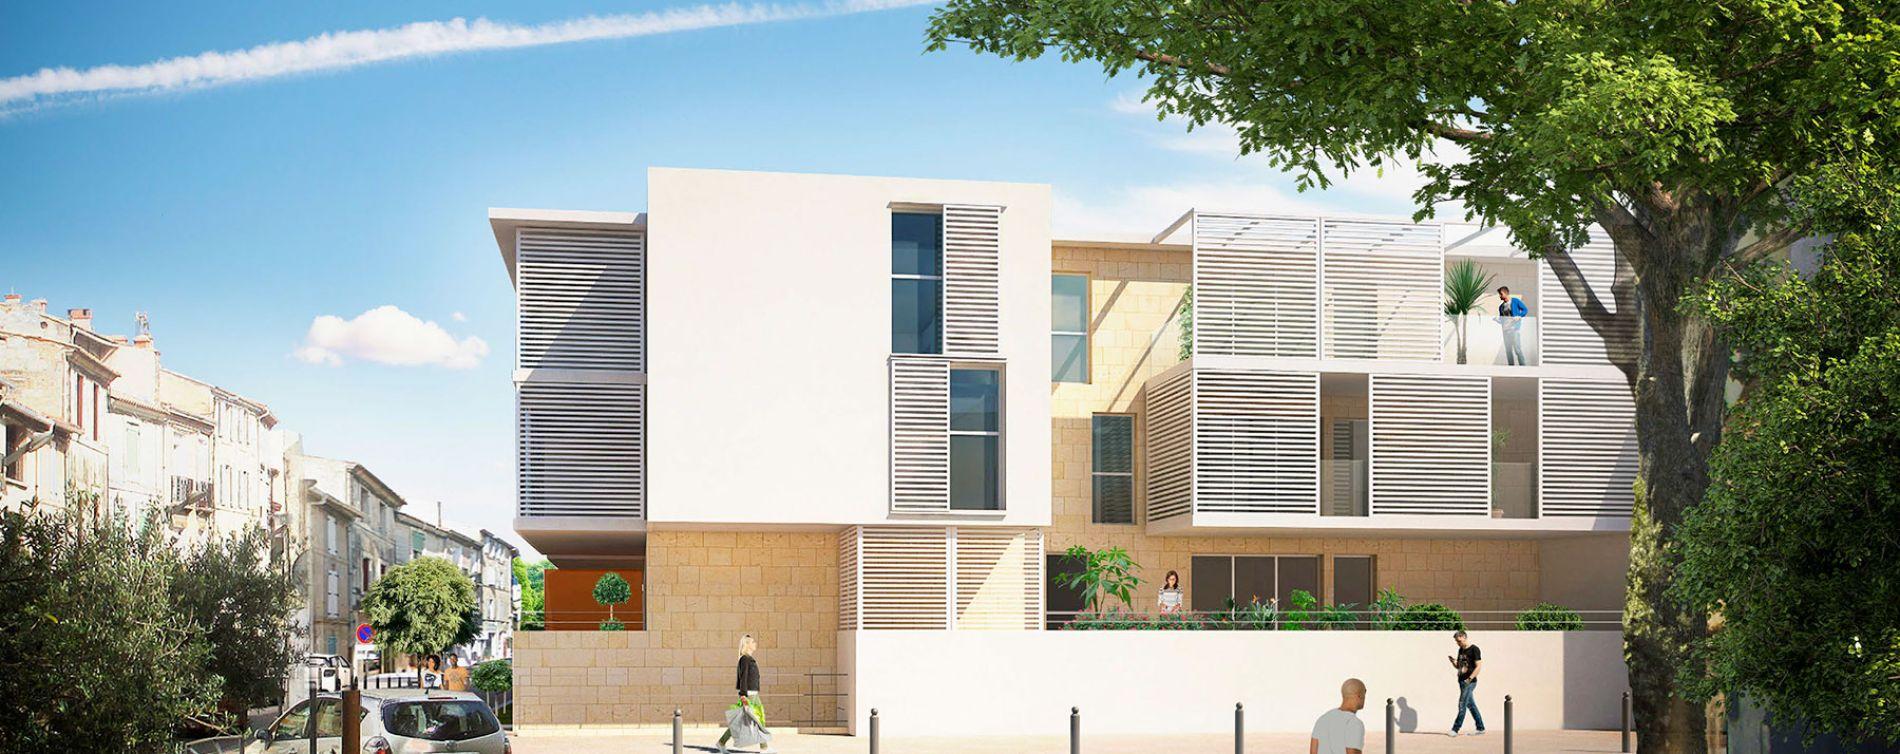 istres village istres programme immobilier neuf n 213360. Black Bedroom Furniture Sets. Home Design Ideas